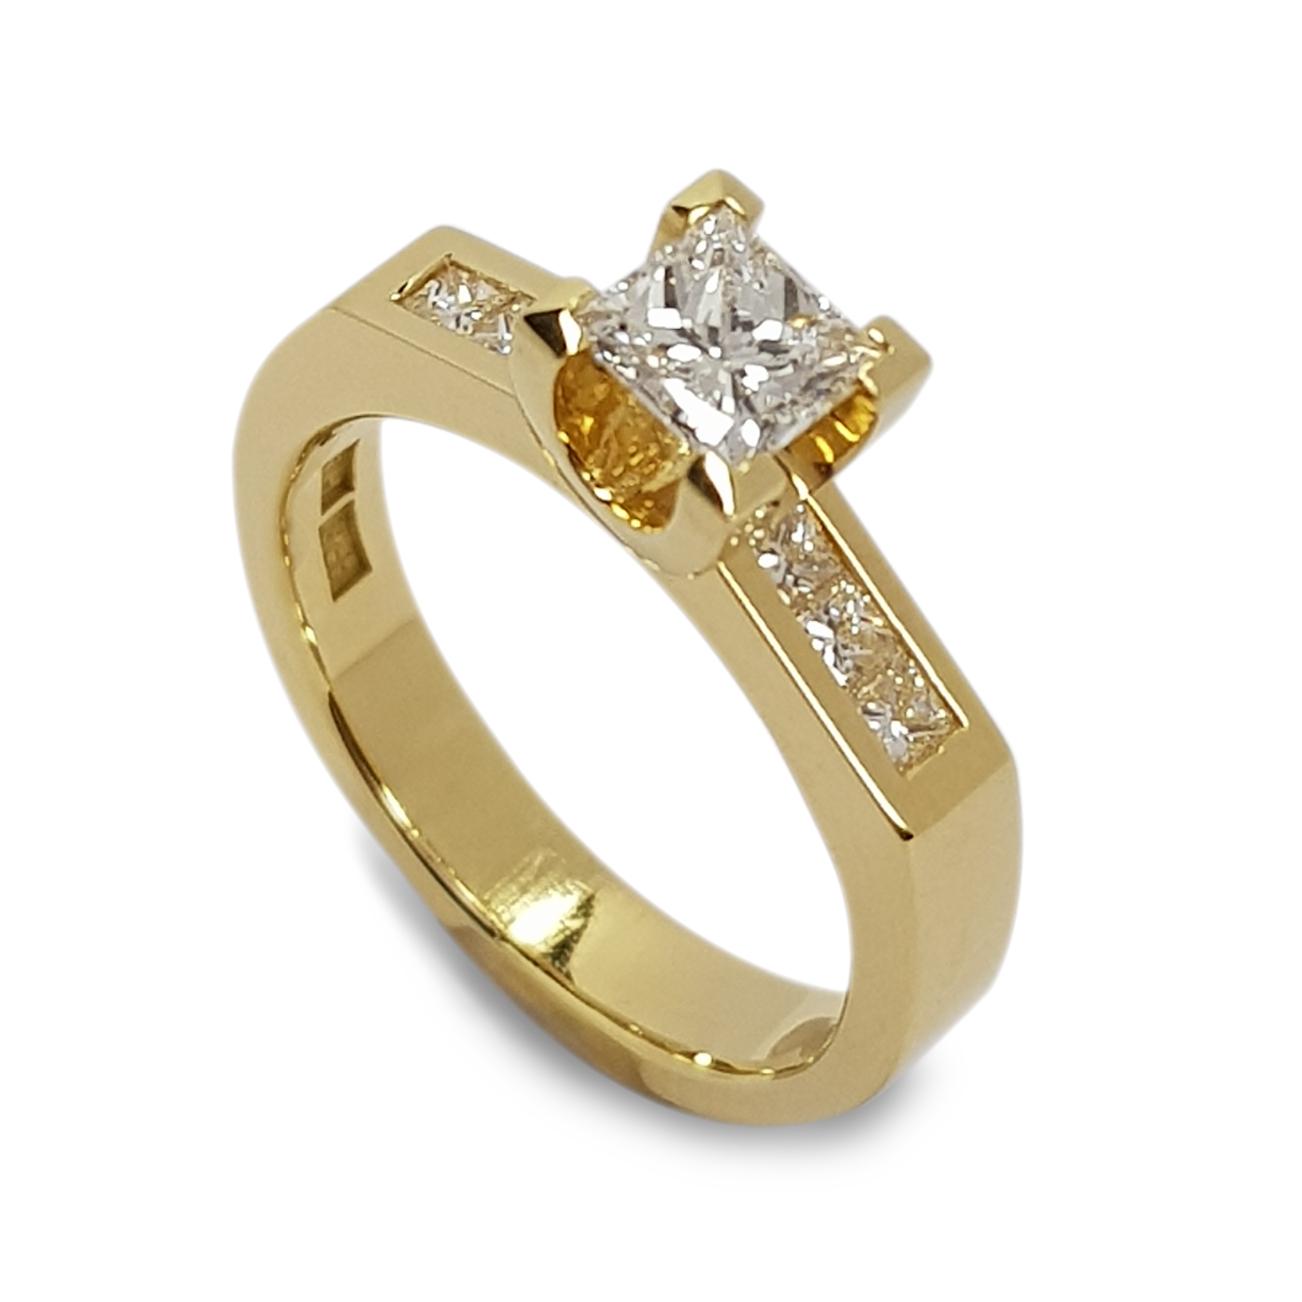 Rudolf Heltzel channel set side stone princess cut engagement ring